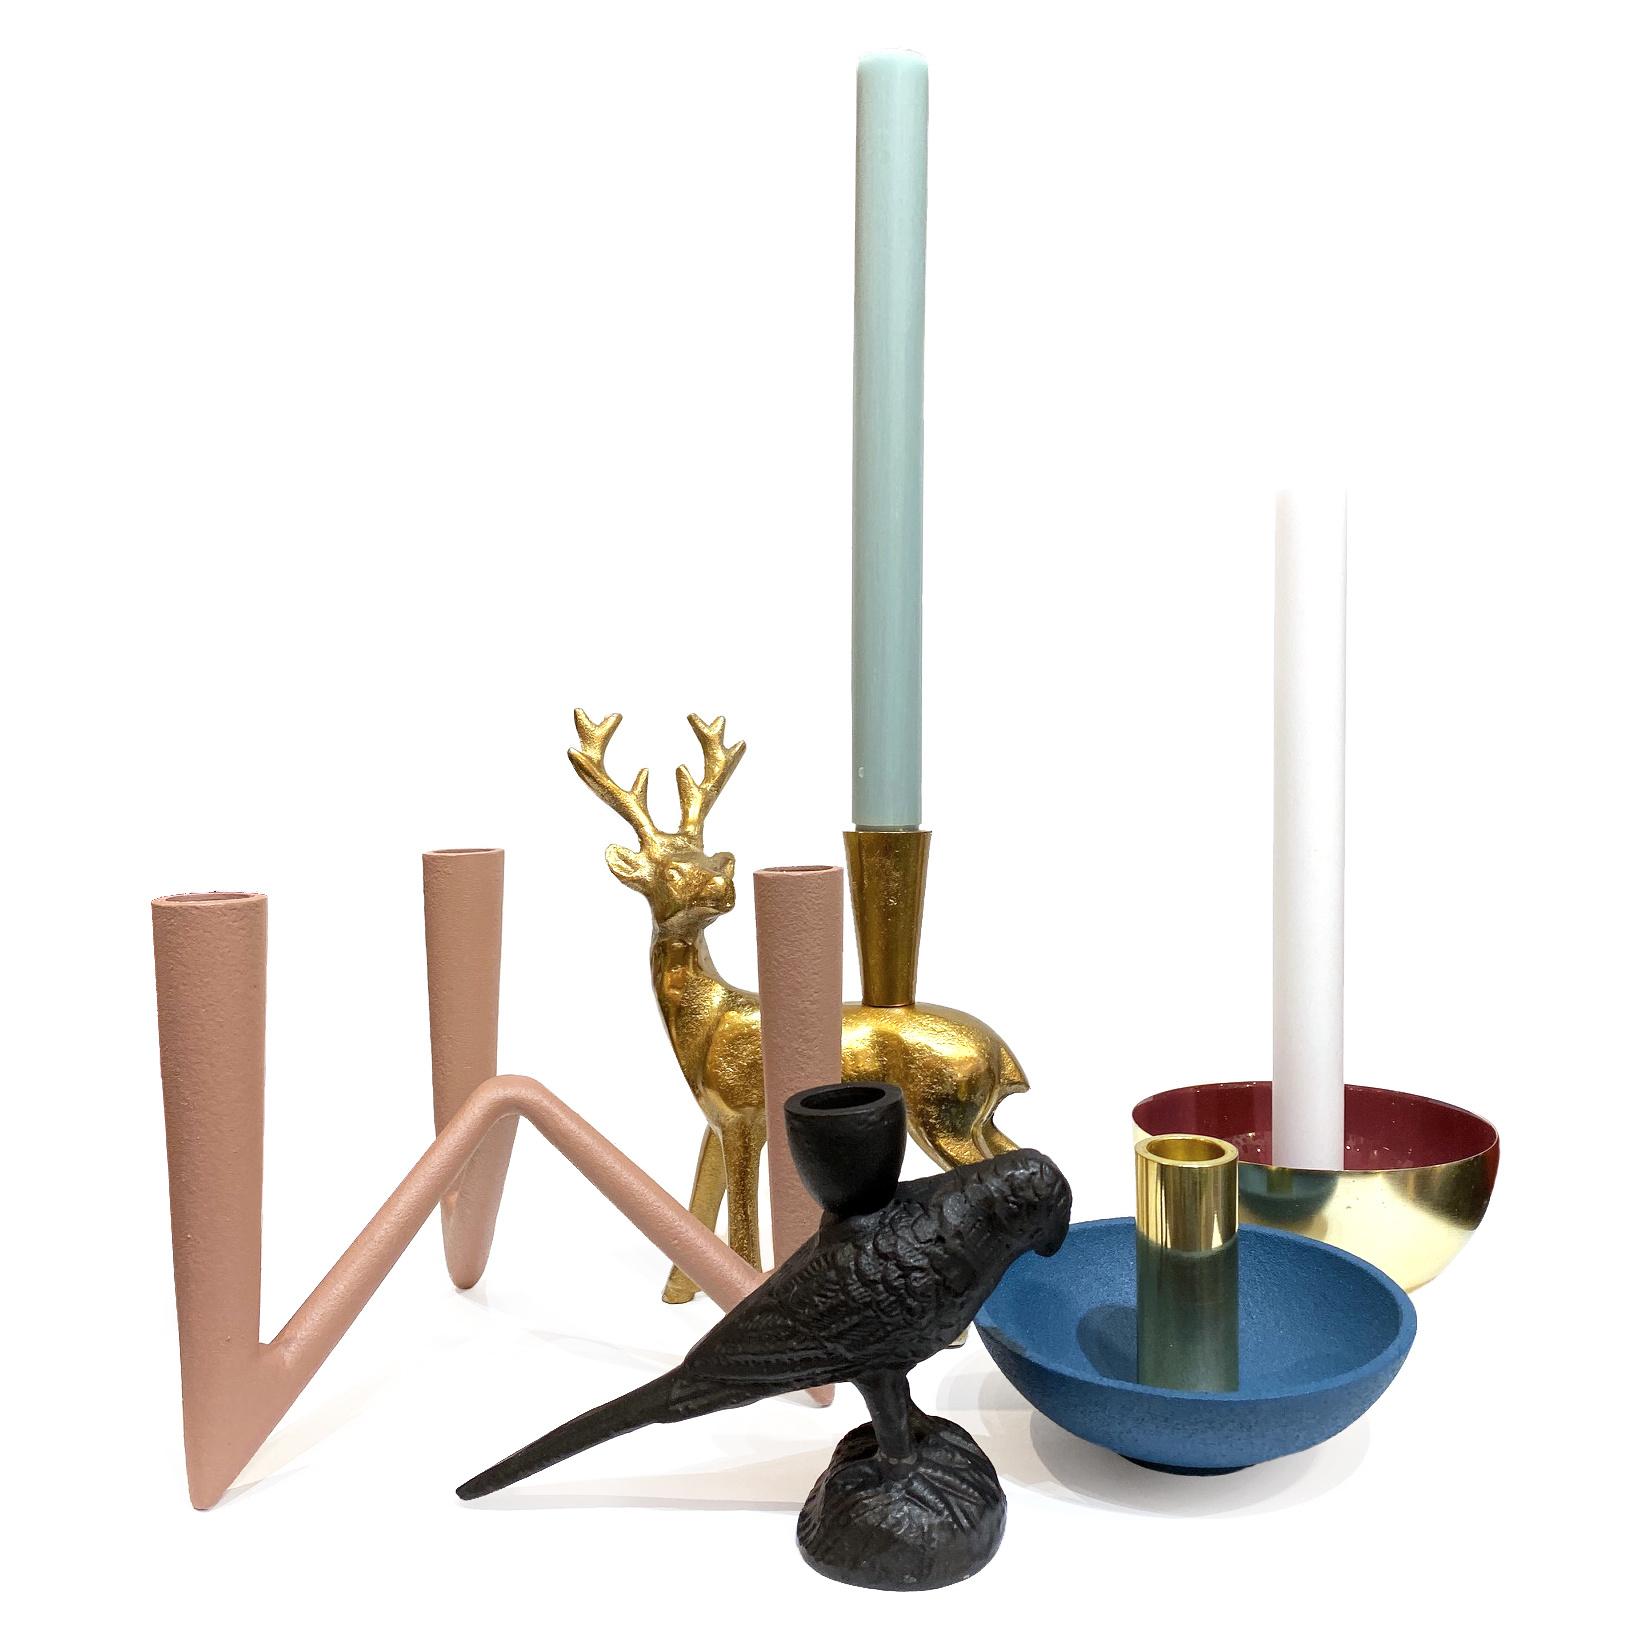 Black toucan candlestick